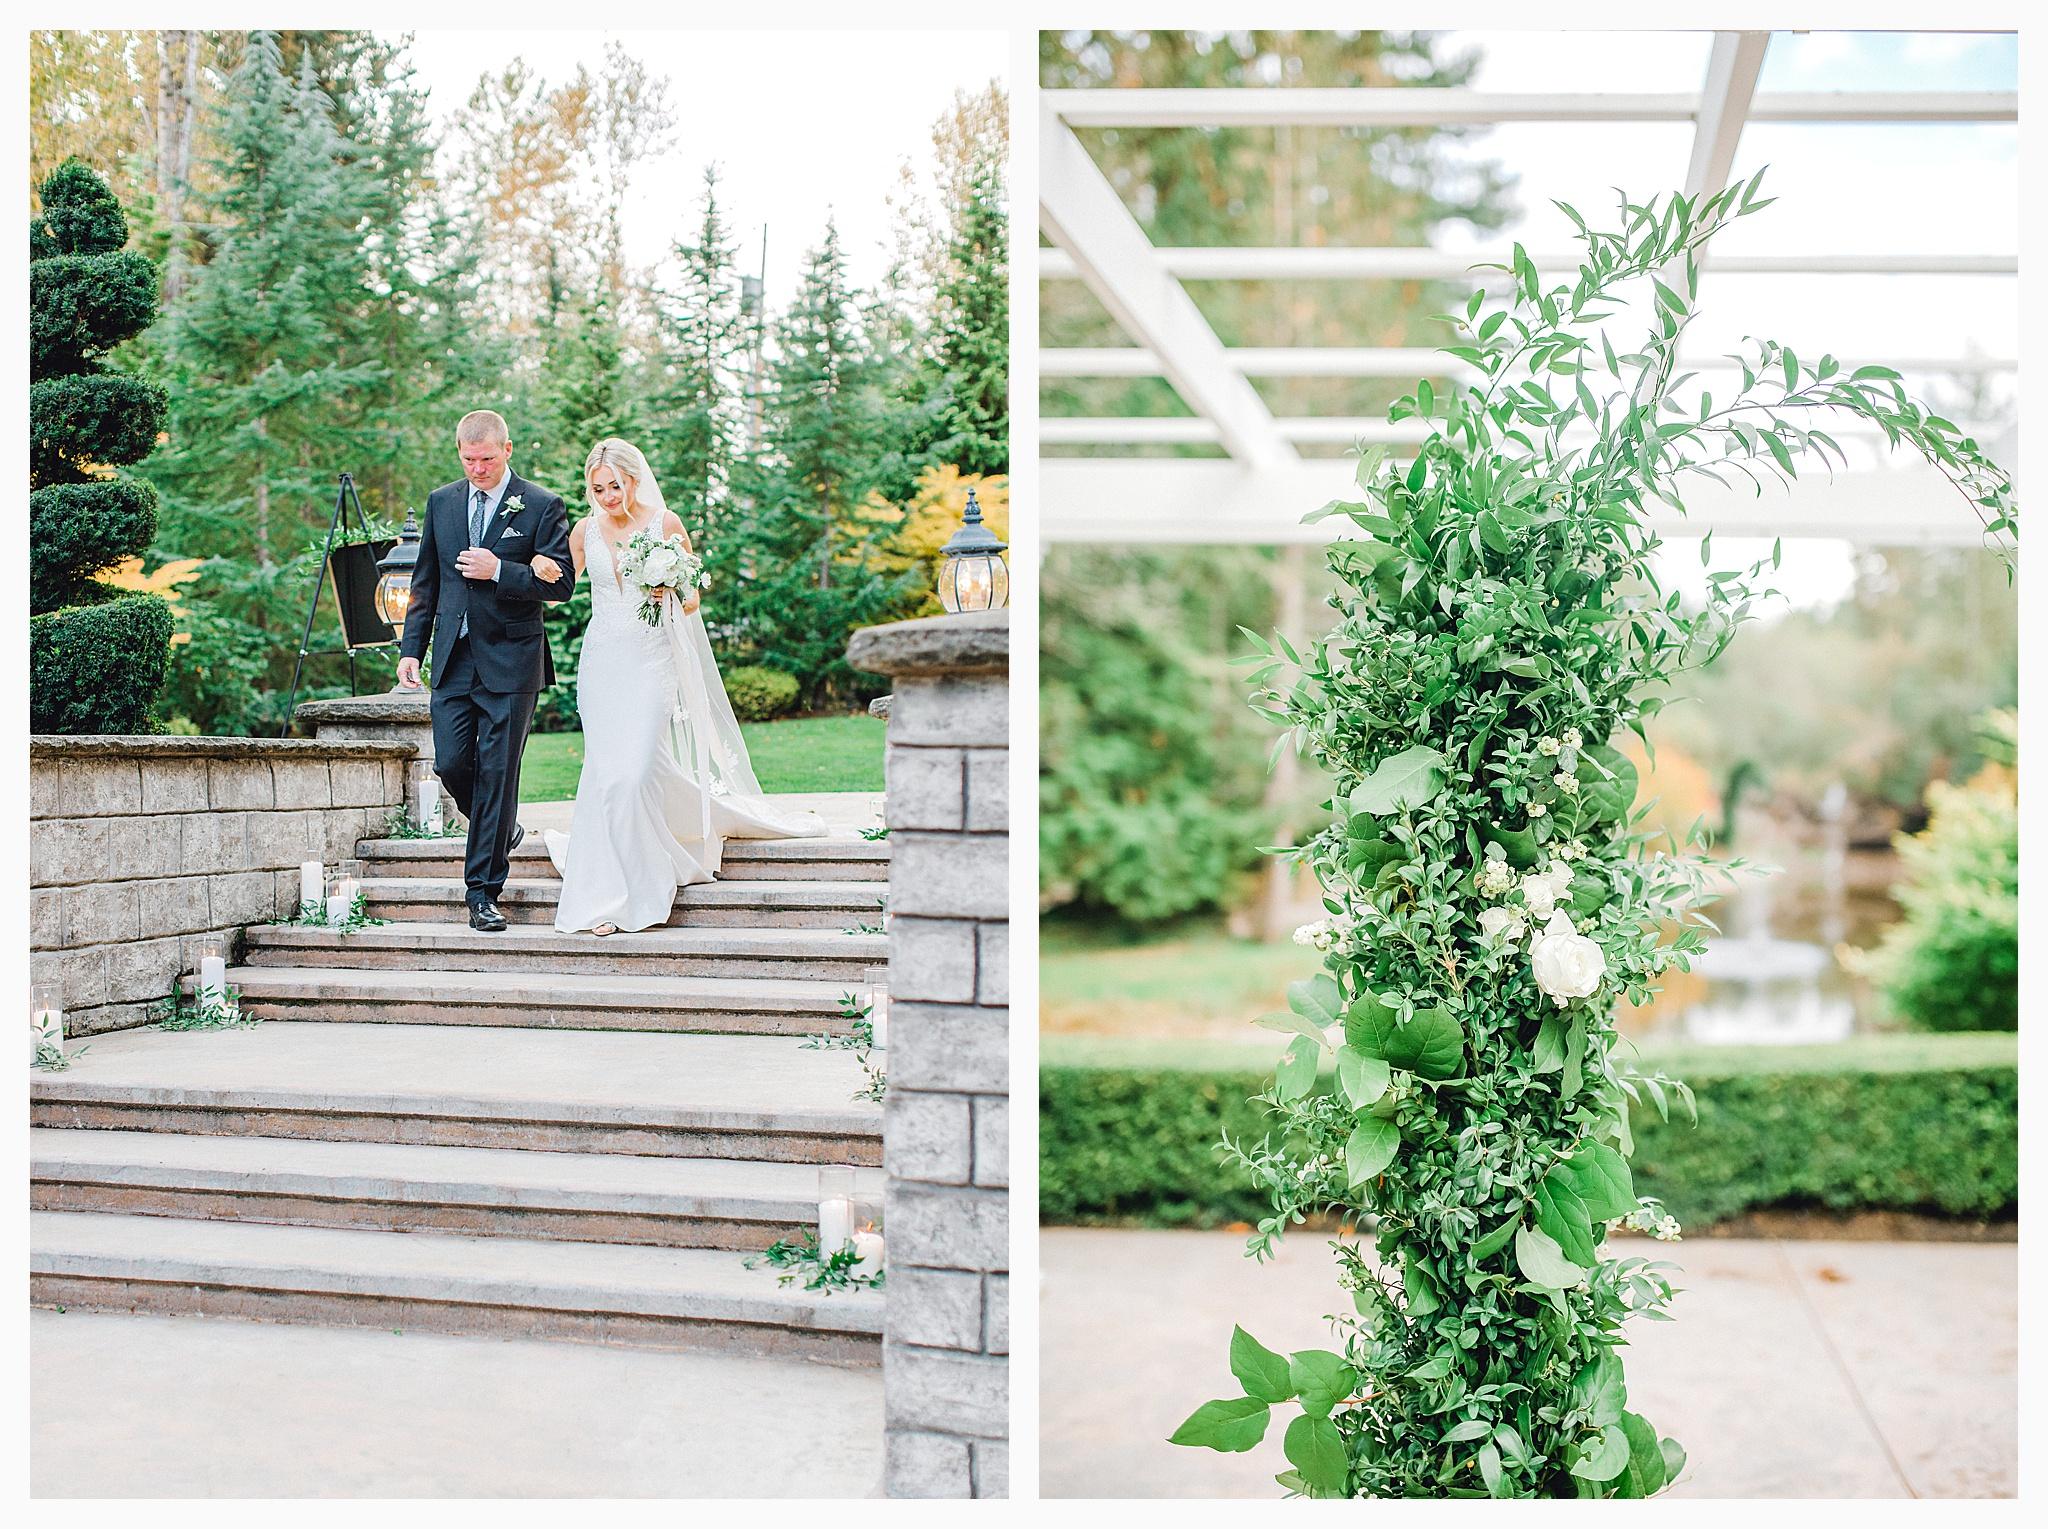 Emma Rose Company Light and Airy Wedding Photographer, Beautiful fall wedding at Rock Creek Gardens Venue in Puyallup, Washington._0073.jpg